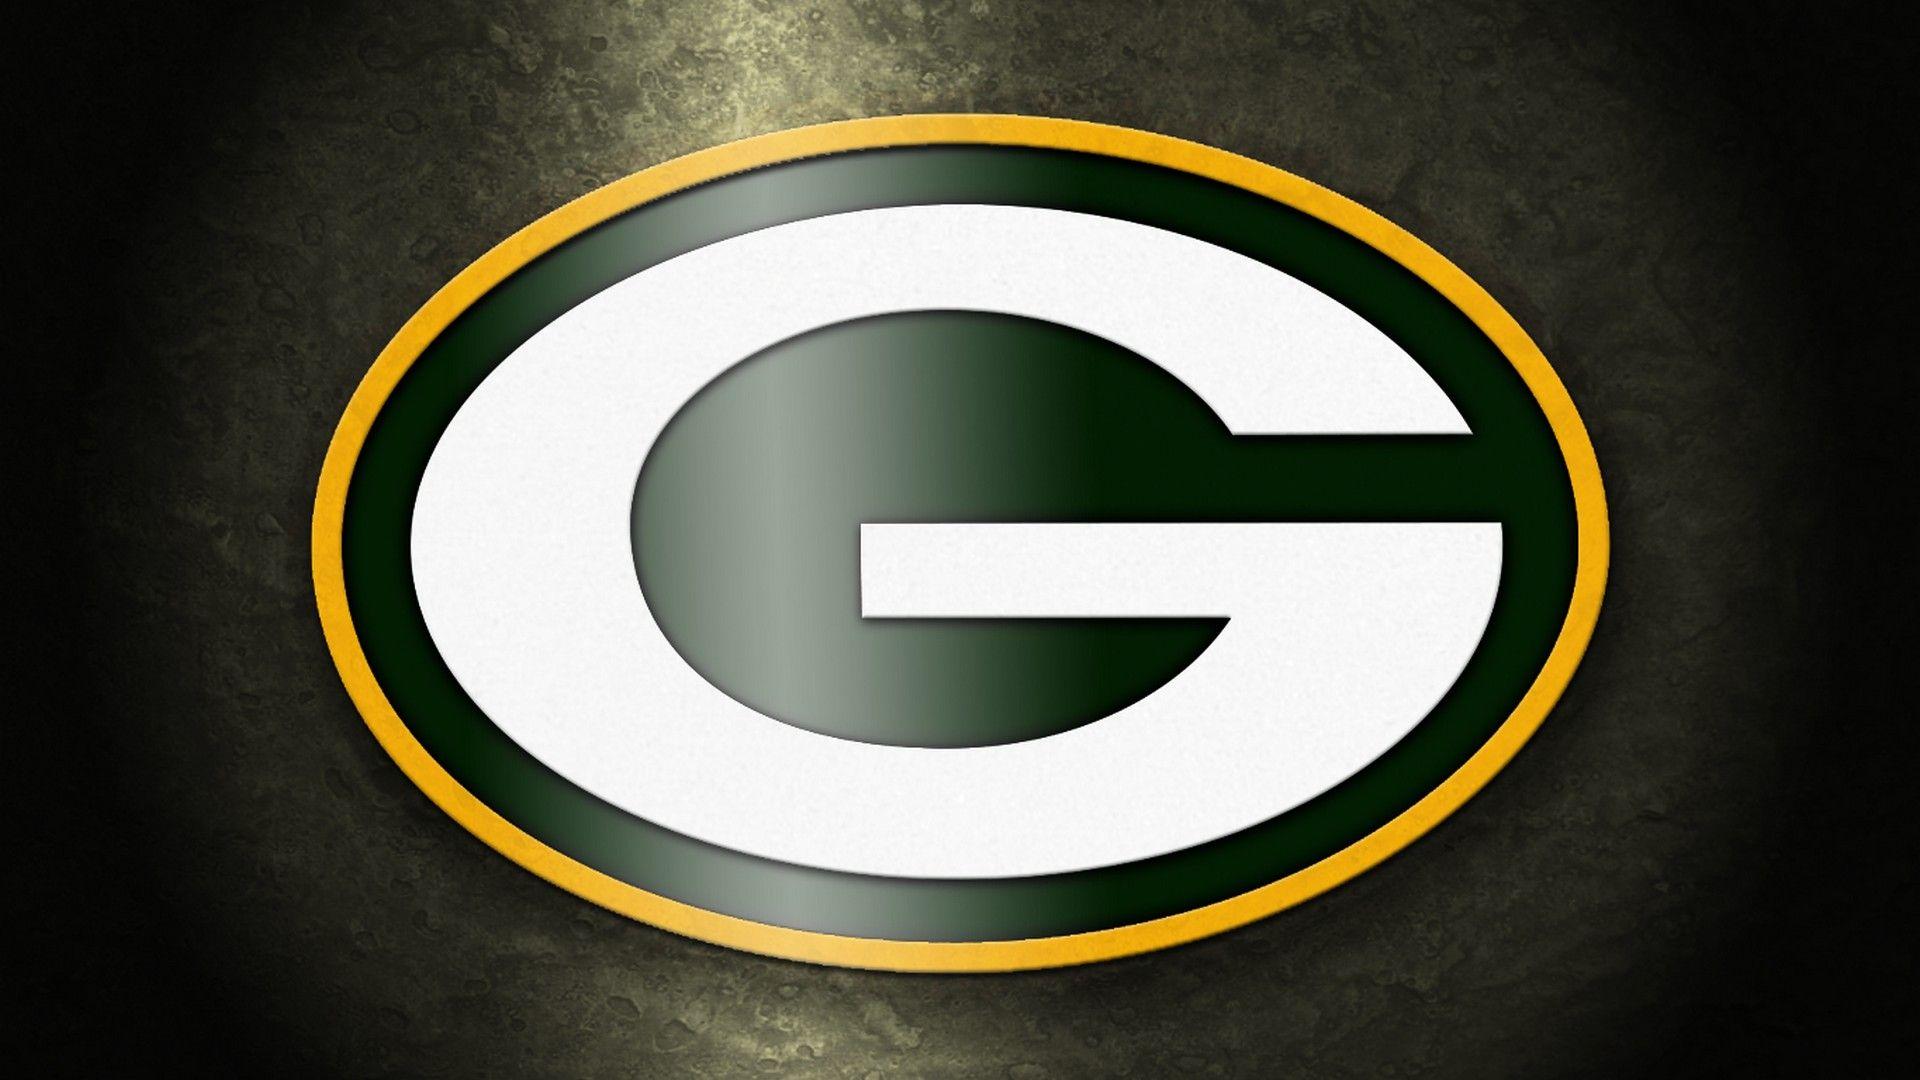 Nfl Wallpapers Green Bay Packers Wallpaper Nfl Week Green Bay Packers